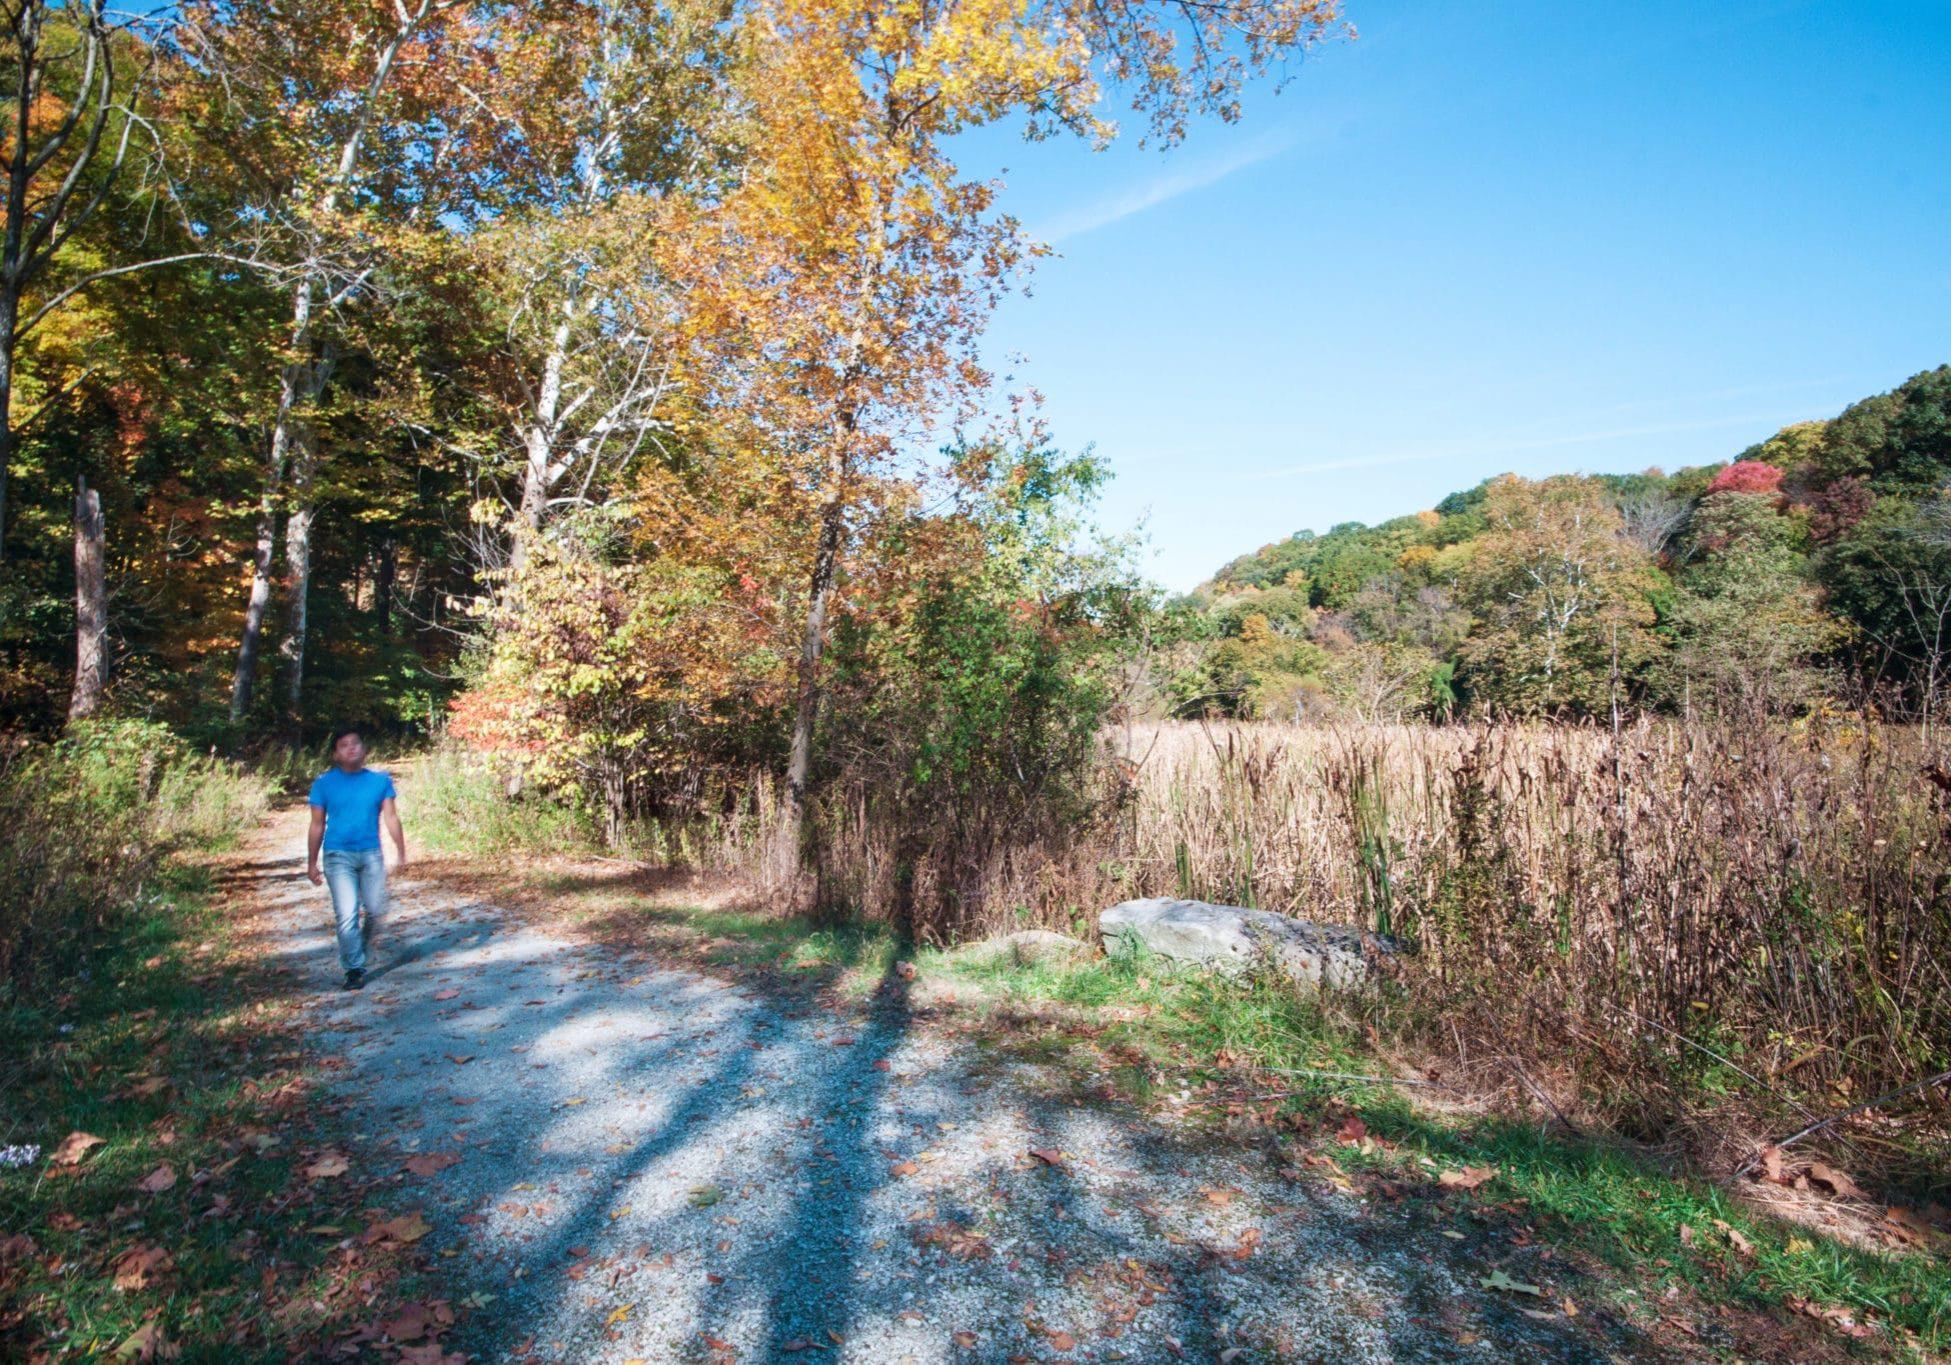 A person walking on a trail through autumn leaves